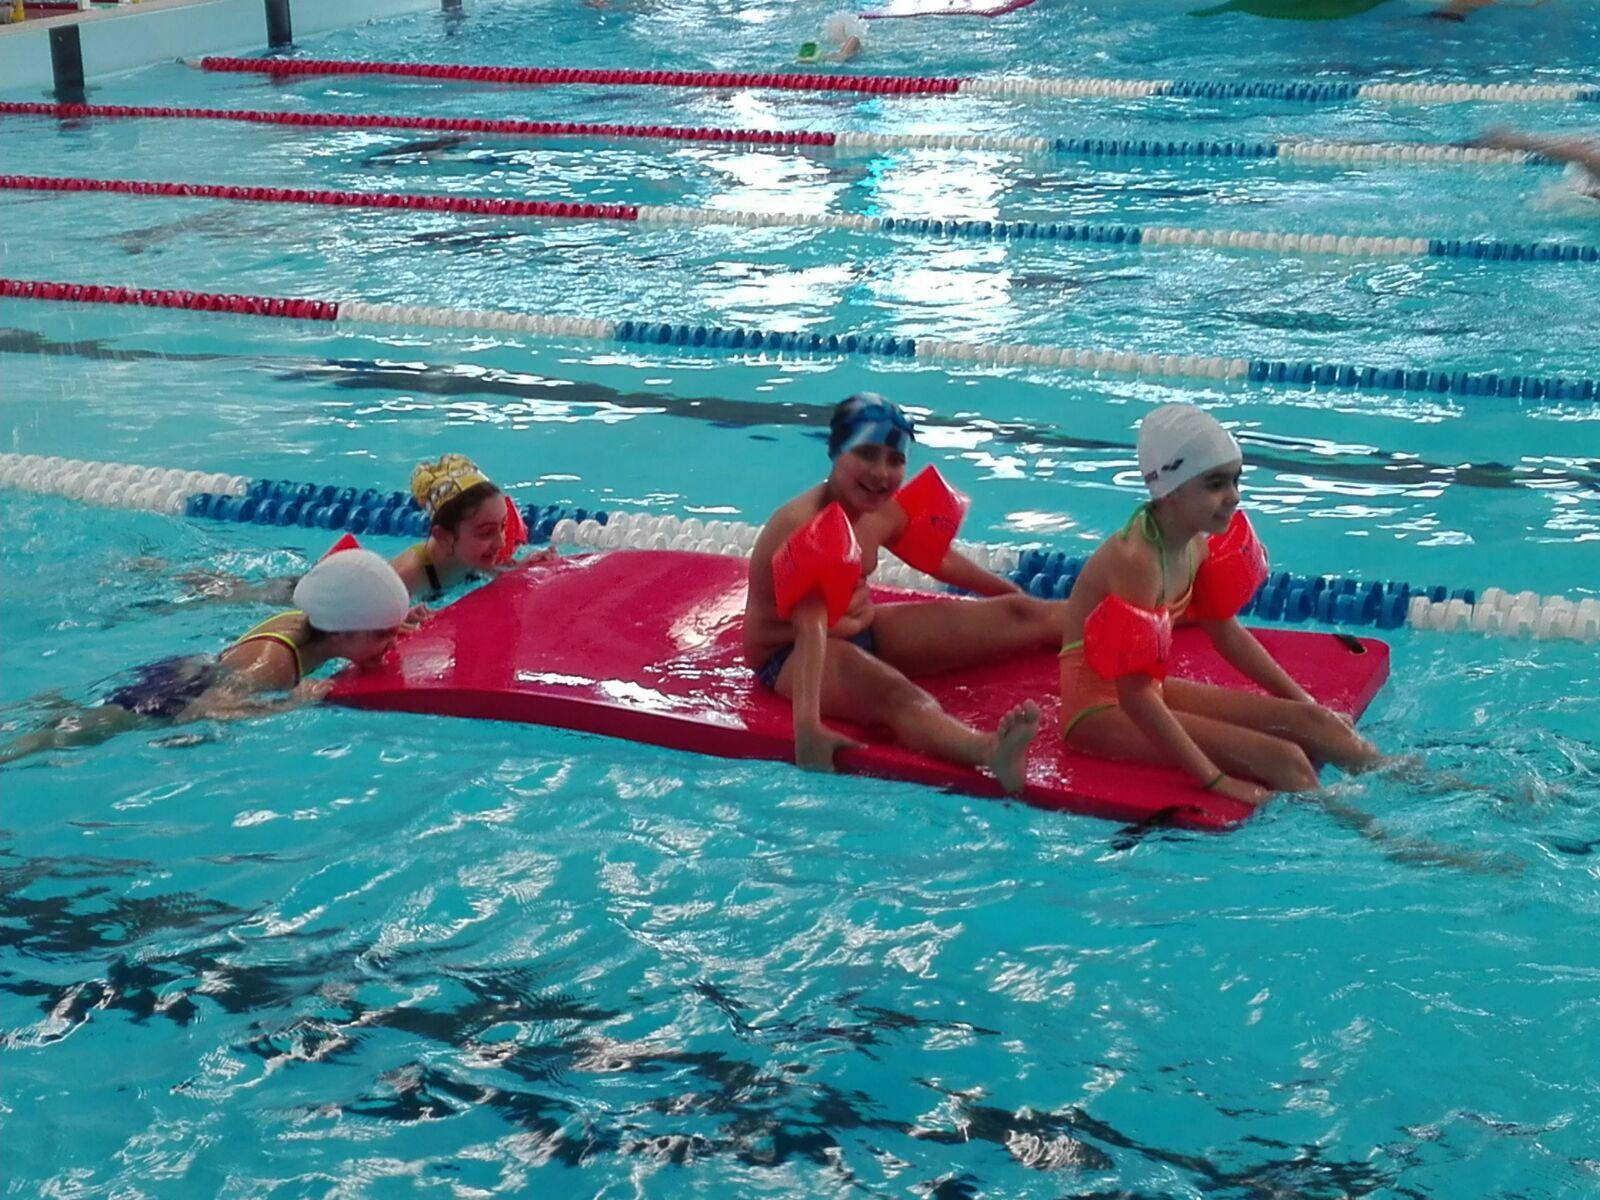 La scuola multitasking cinema piscina e incontri cm junior - Orientamento piscina ...